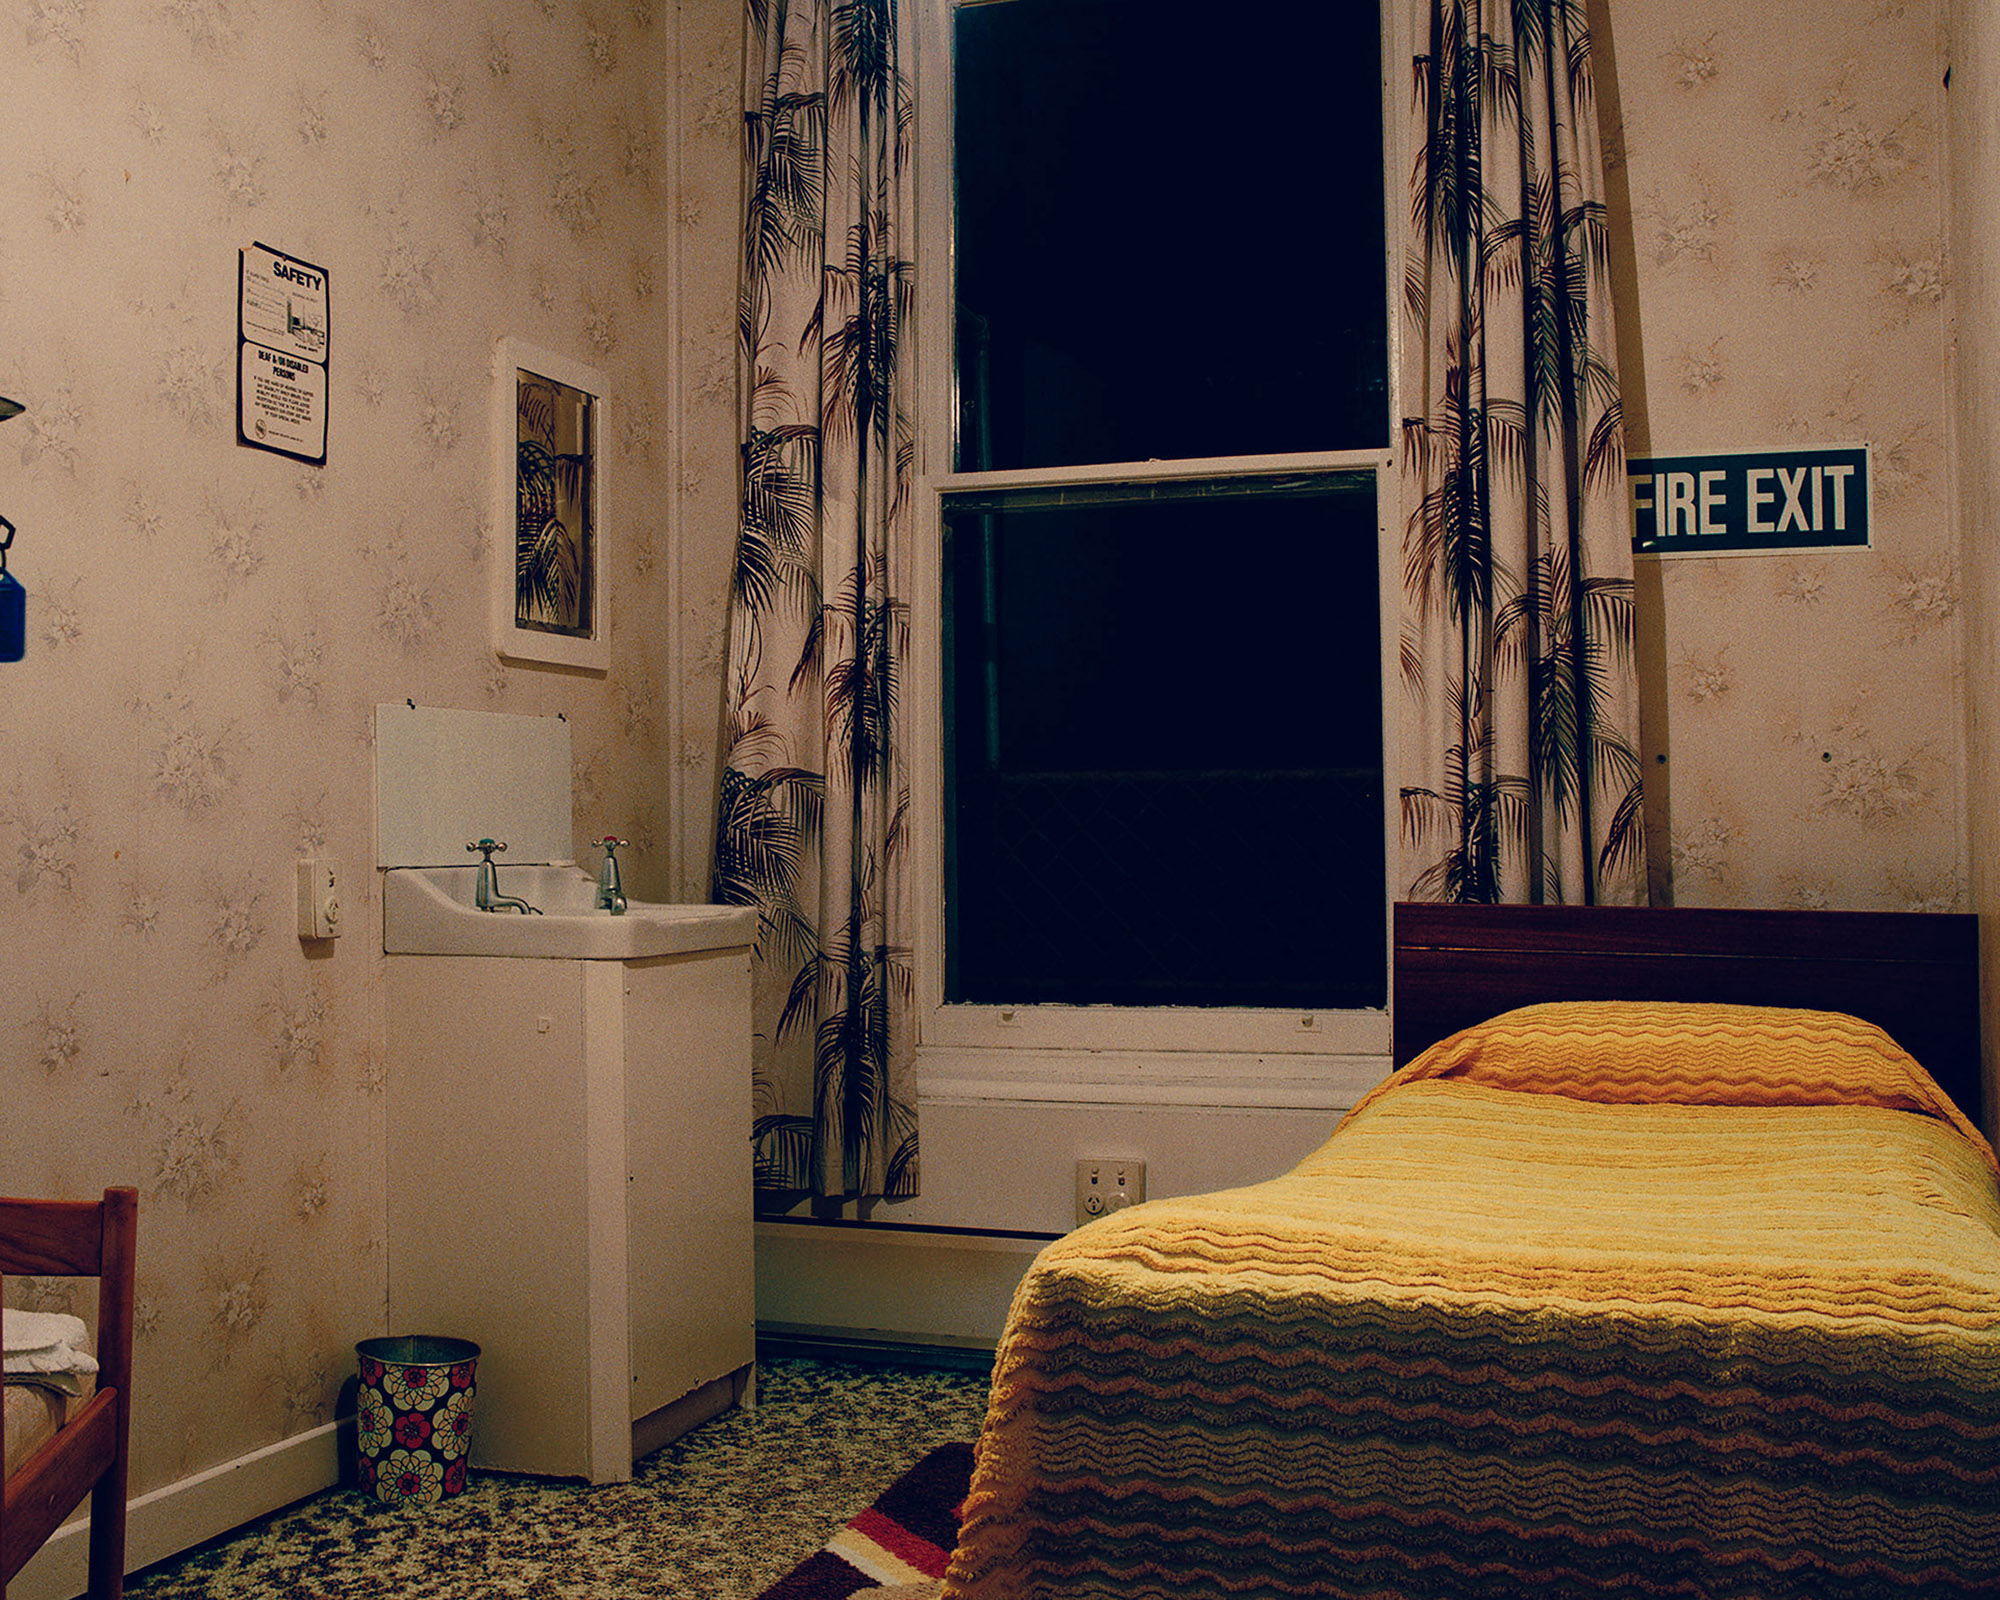 Room 6, Lumsden Hotel, 6 Diana St, Lumsden, Southland, New Zealand 2004. © Alan McFetridge